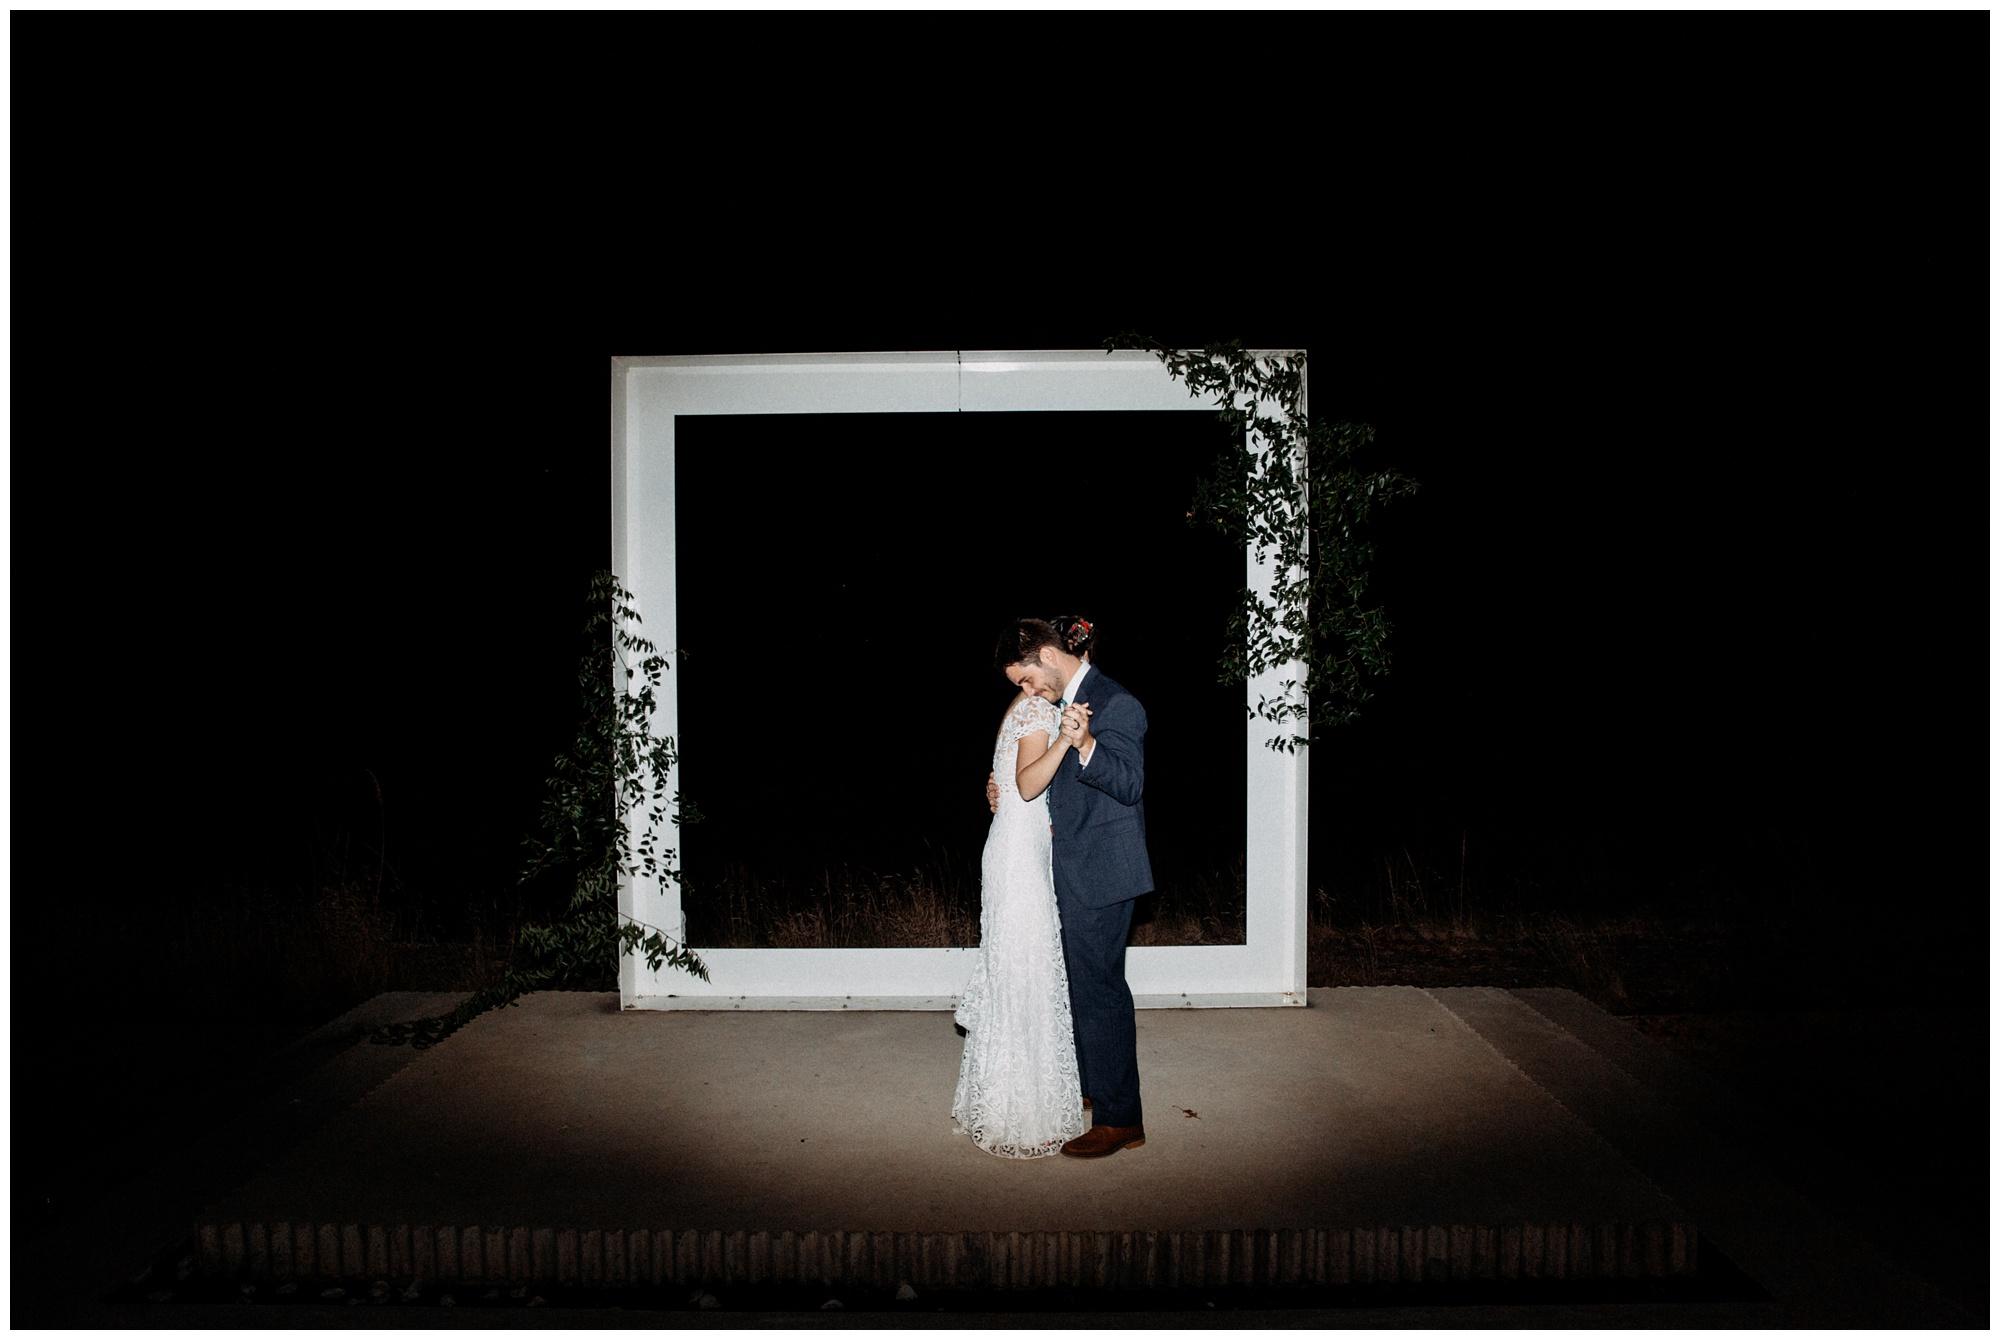 AUSTIN-TEXAS-PROSPECT-HOUSE-WEDDING-VENUE-PHOTOGRAPHY25857.JPG